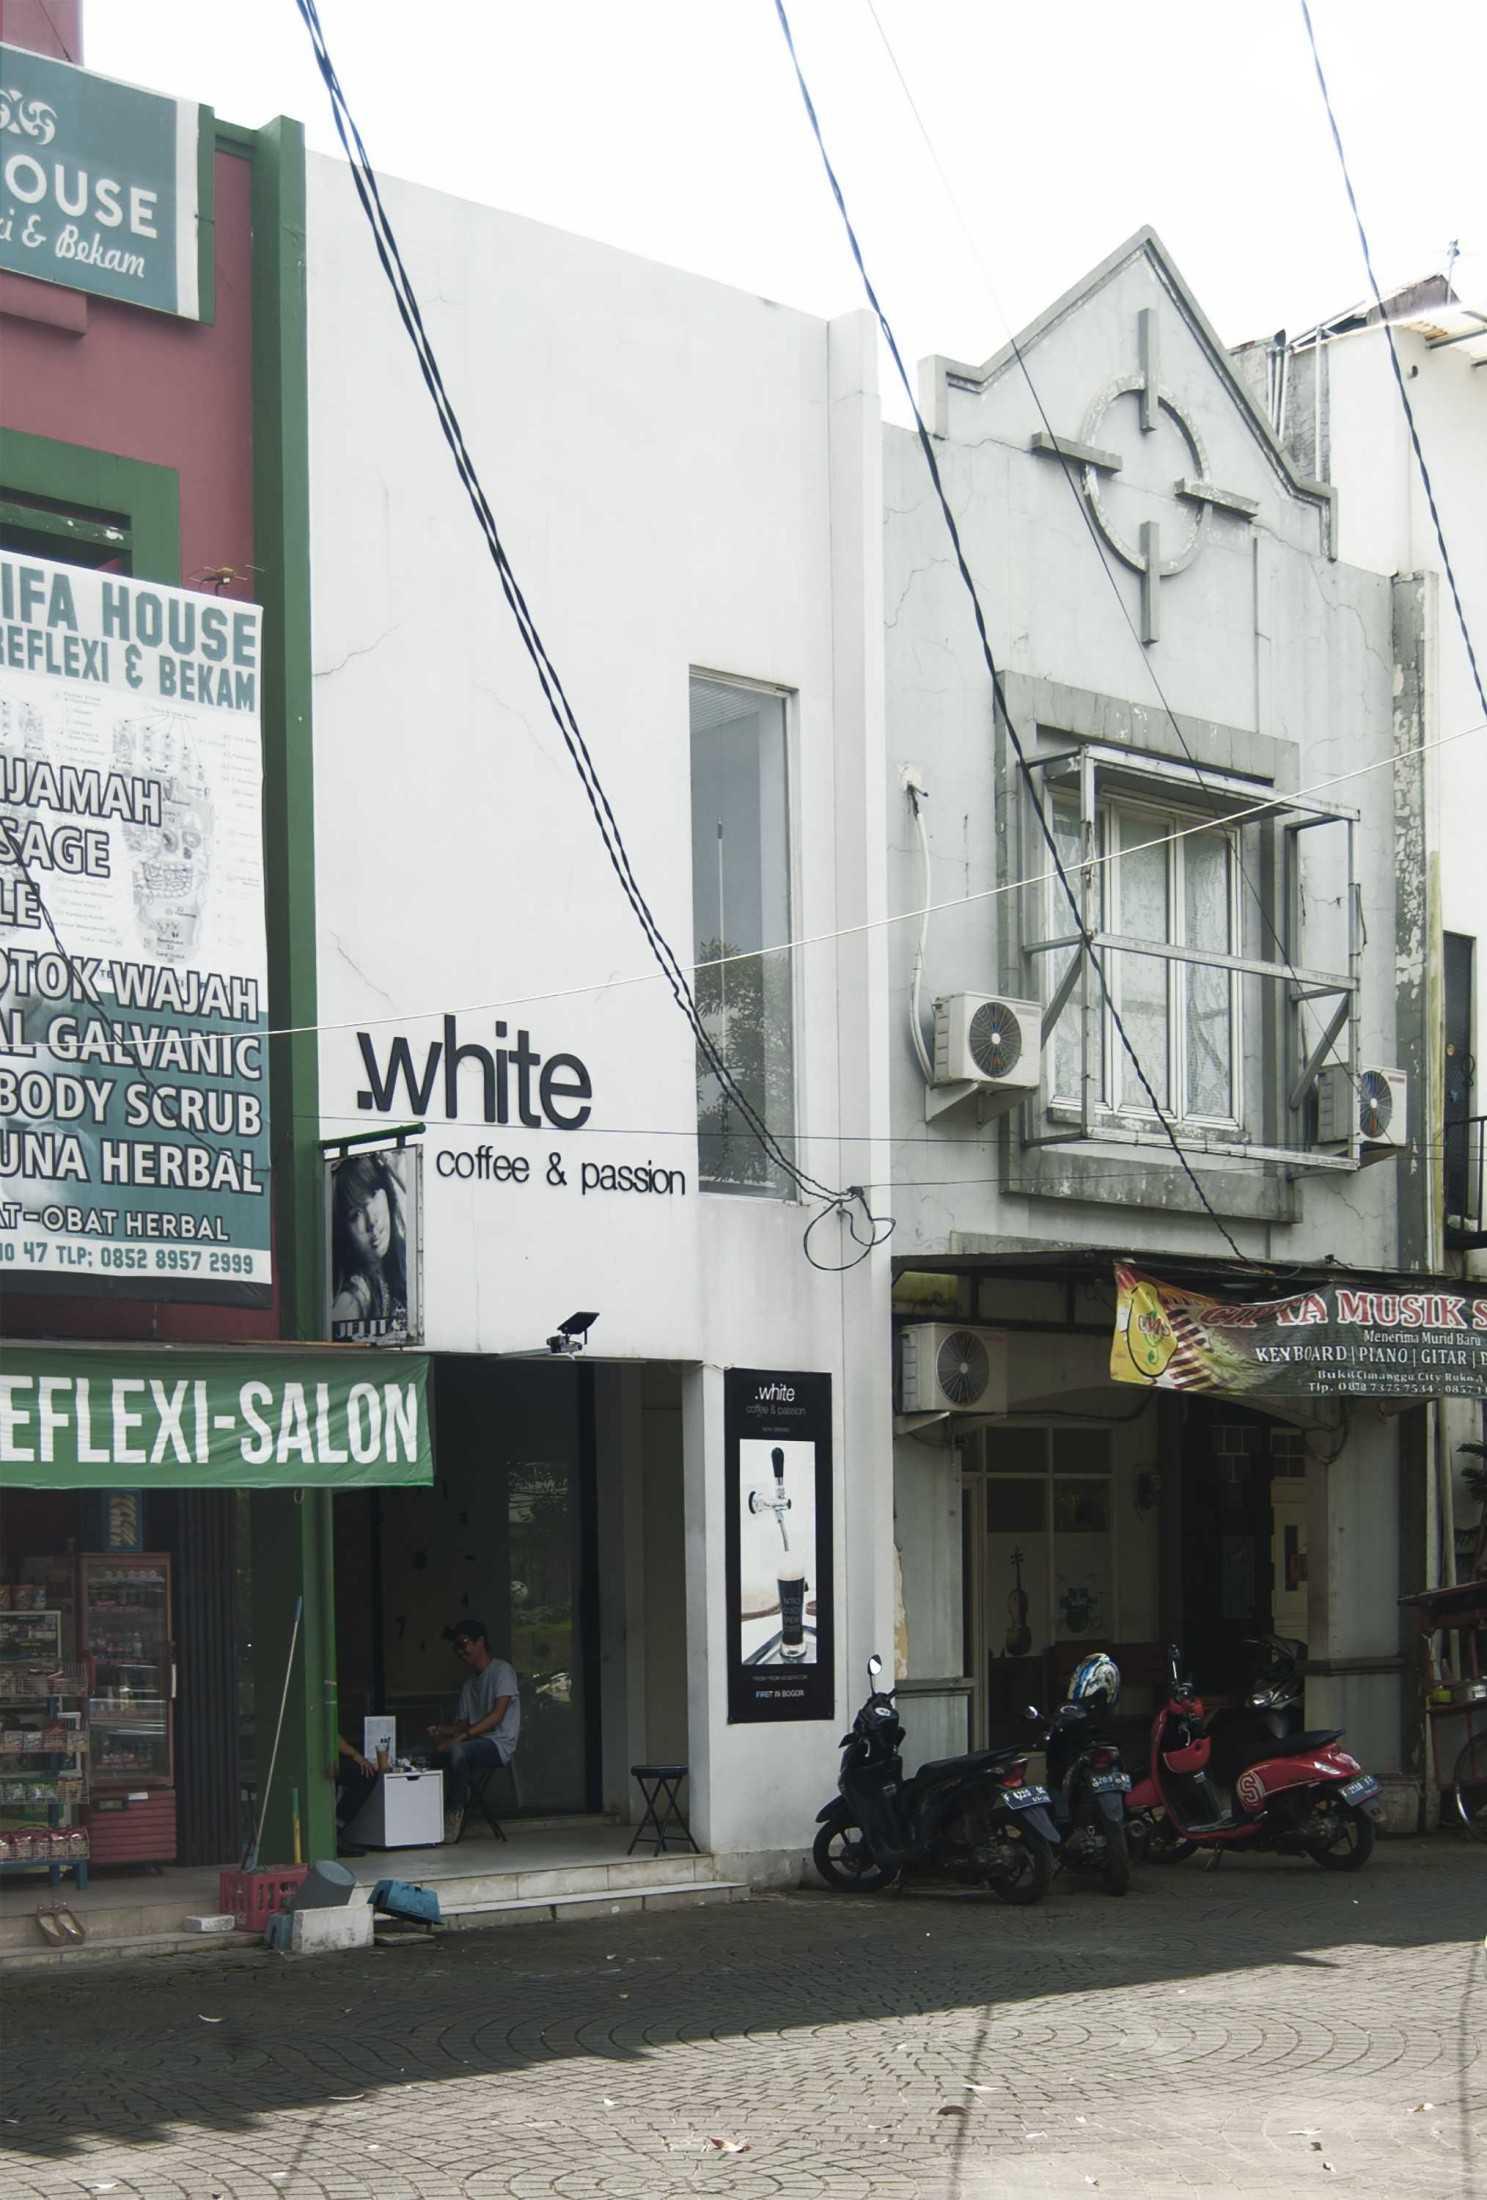 Ads Architect Kafe Kotak Putih Sentul Selatan Sentul Selatan Ads-Architect-Kafe-Kotak-Putih  53518